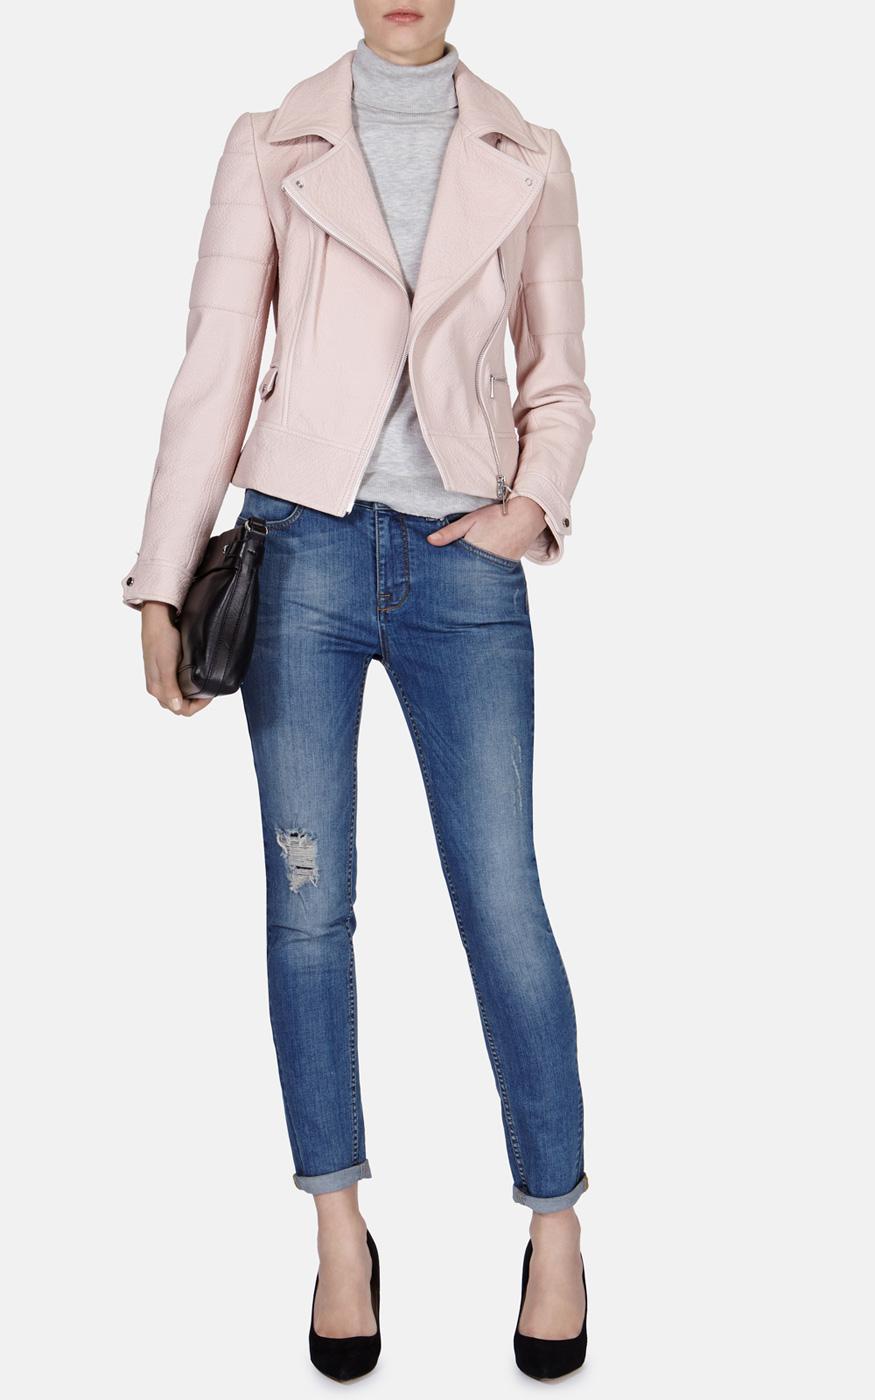 3b9f34056 Karen Millen Pastel Leather Biker Jacket in Pink - Lyst